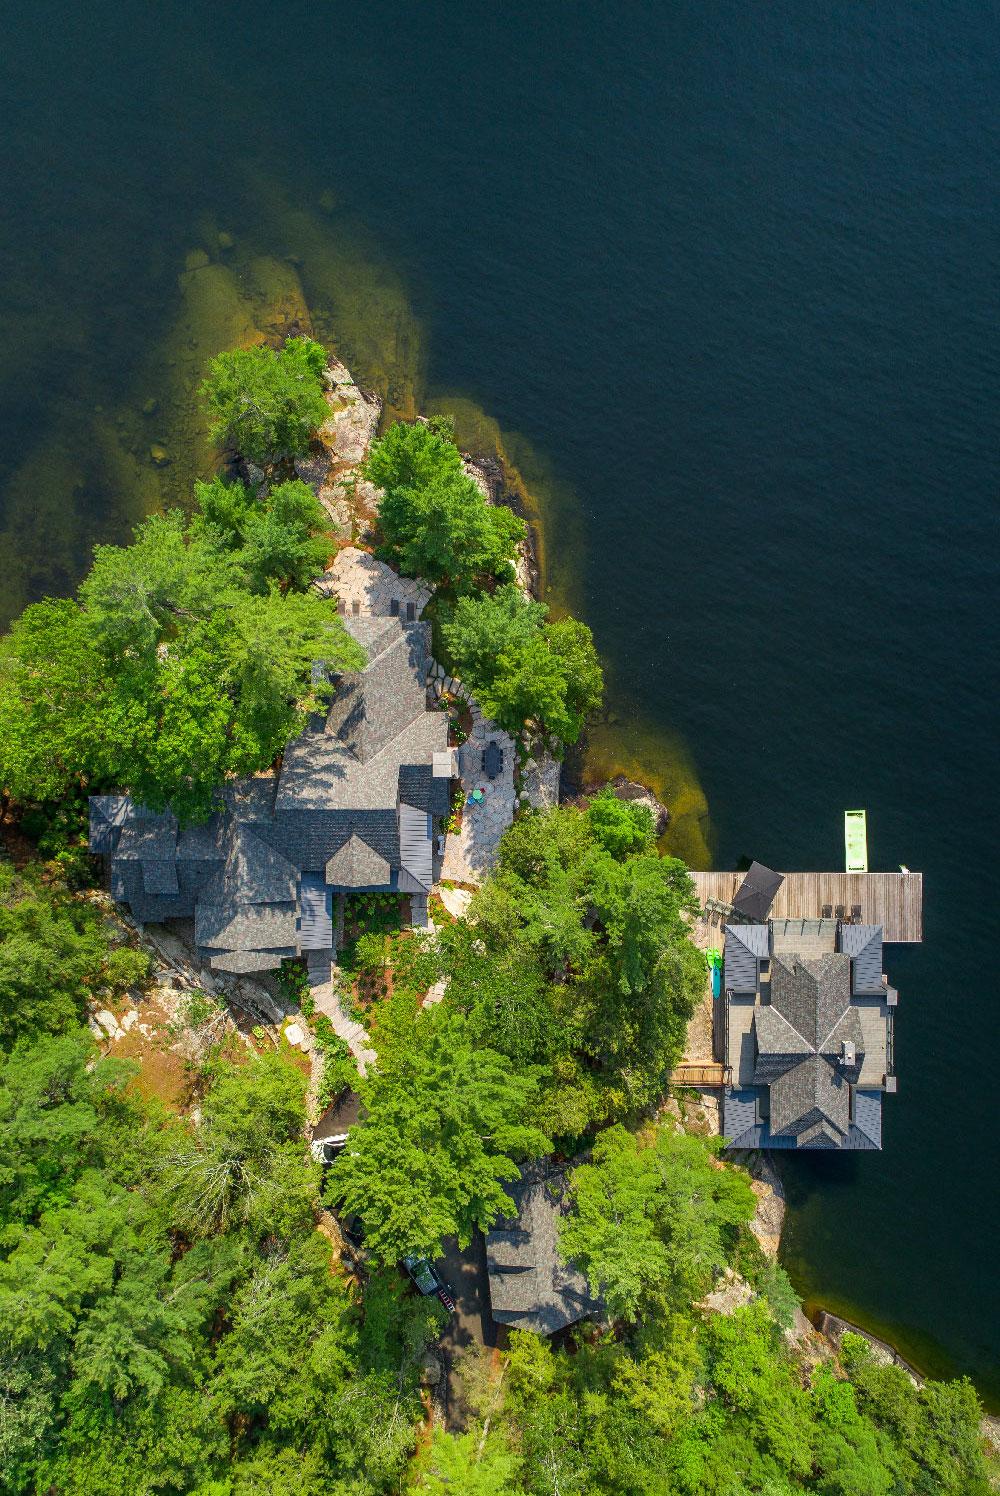 ariel of landscaped island